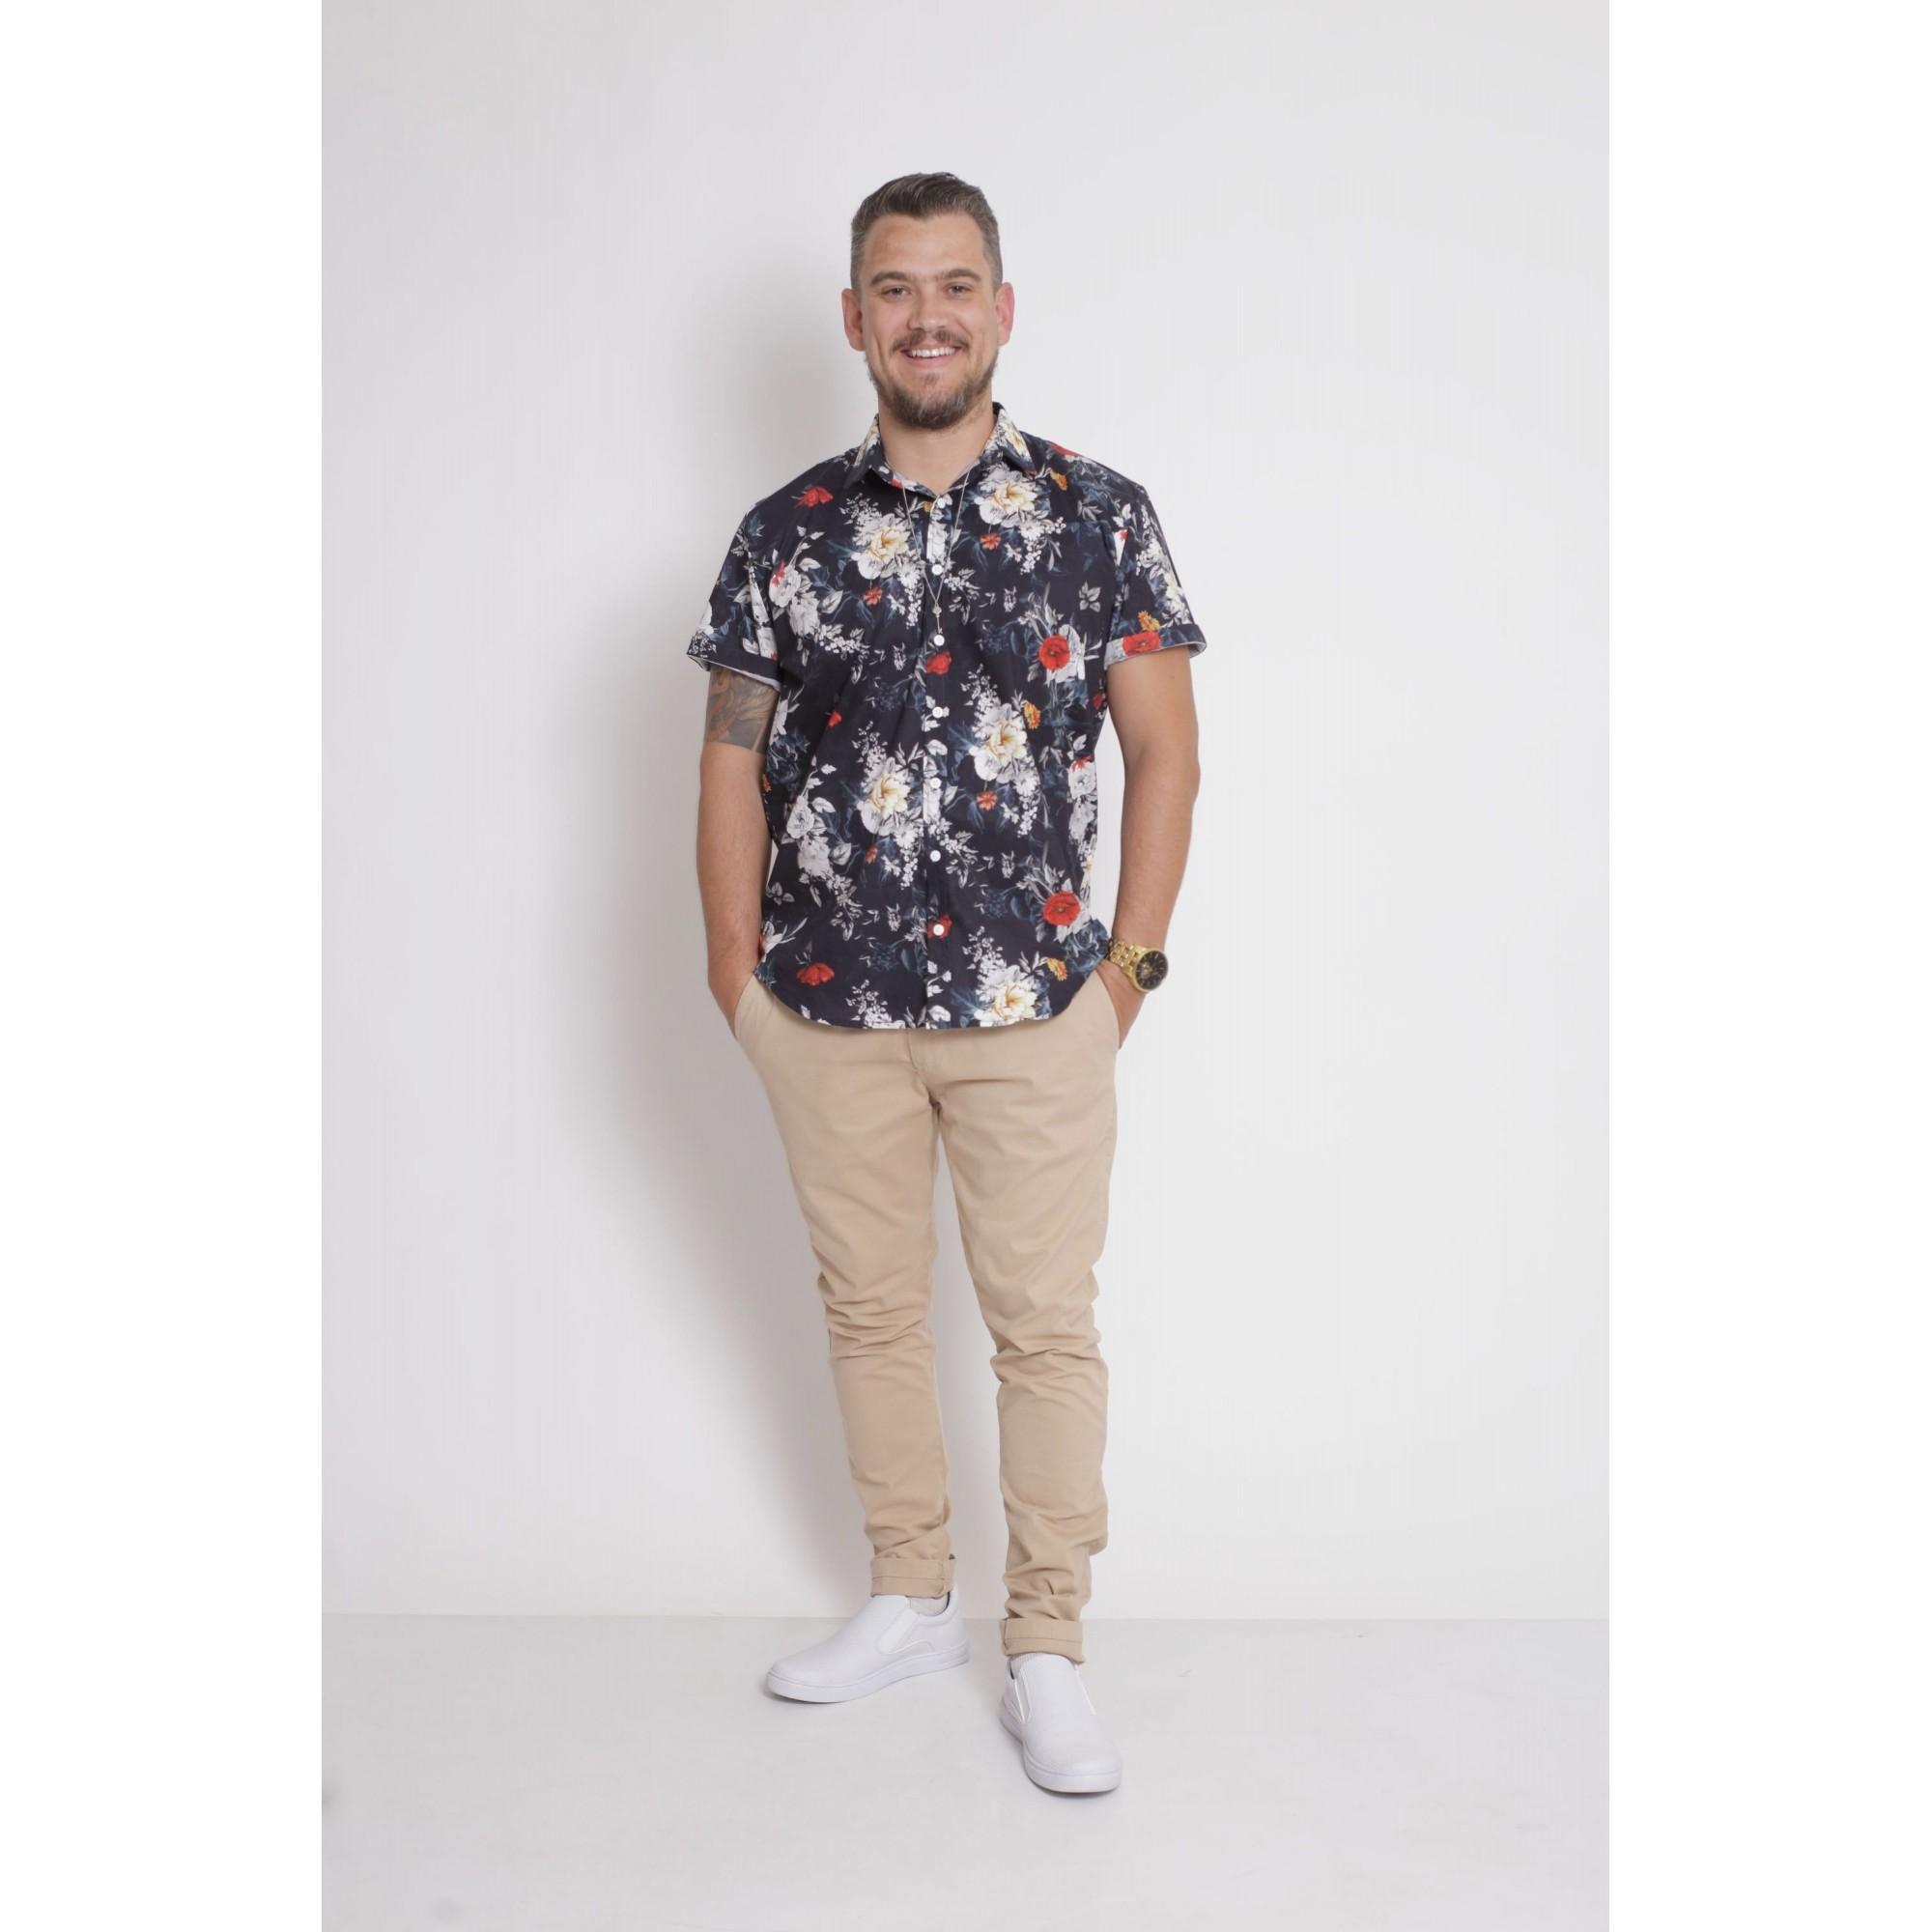 PAI E FILHA > Kit 02 Camisas Manga Curta Preta Floral [Coleção Tal Pai Tal Filha]  - Heitor Fashion Brazil